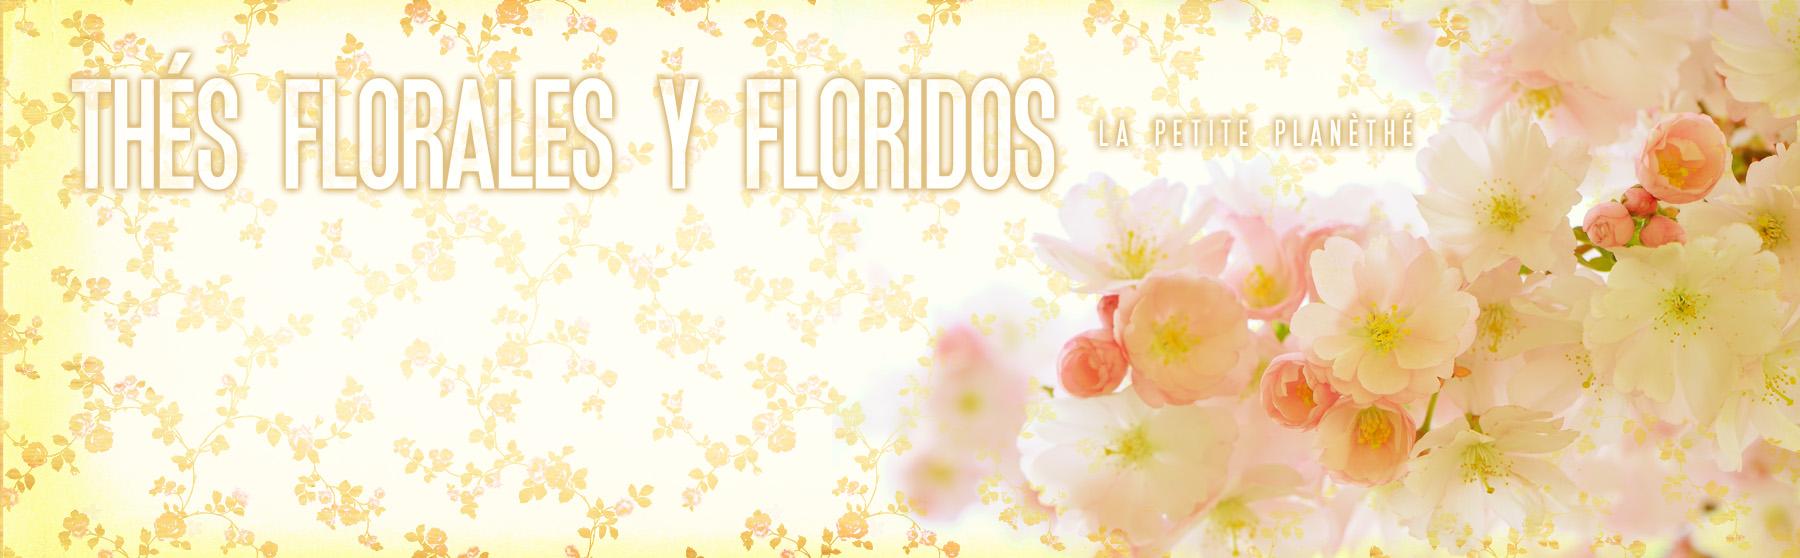 Thés Florales - primavera 2018